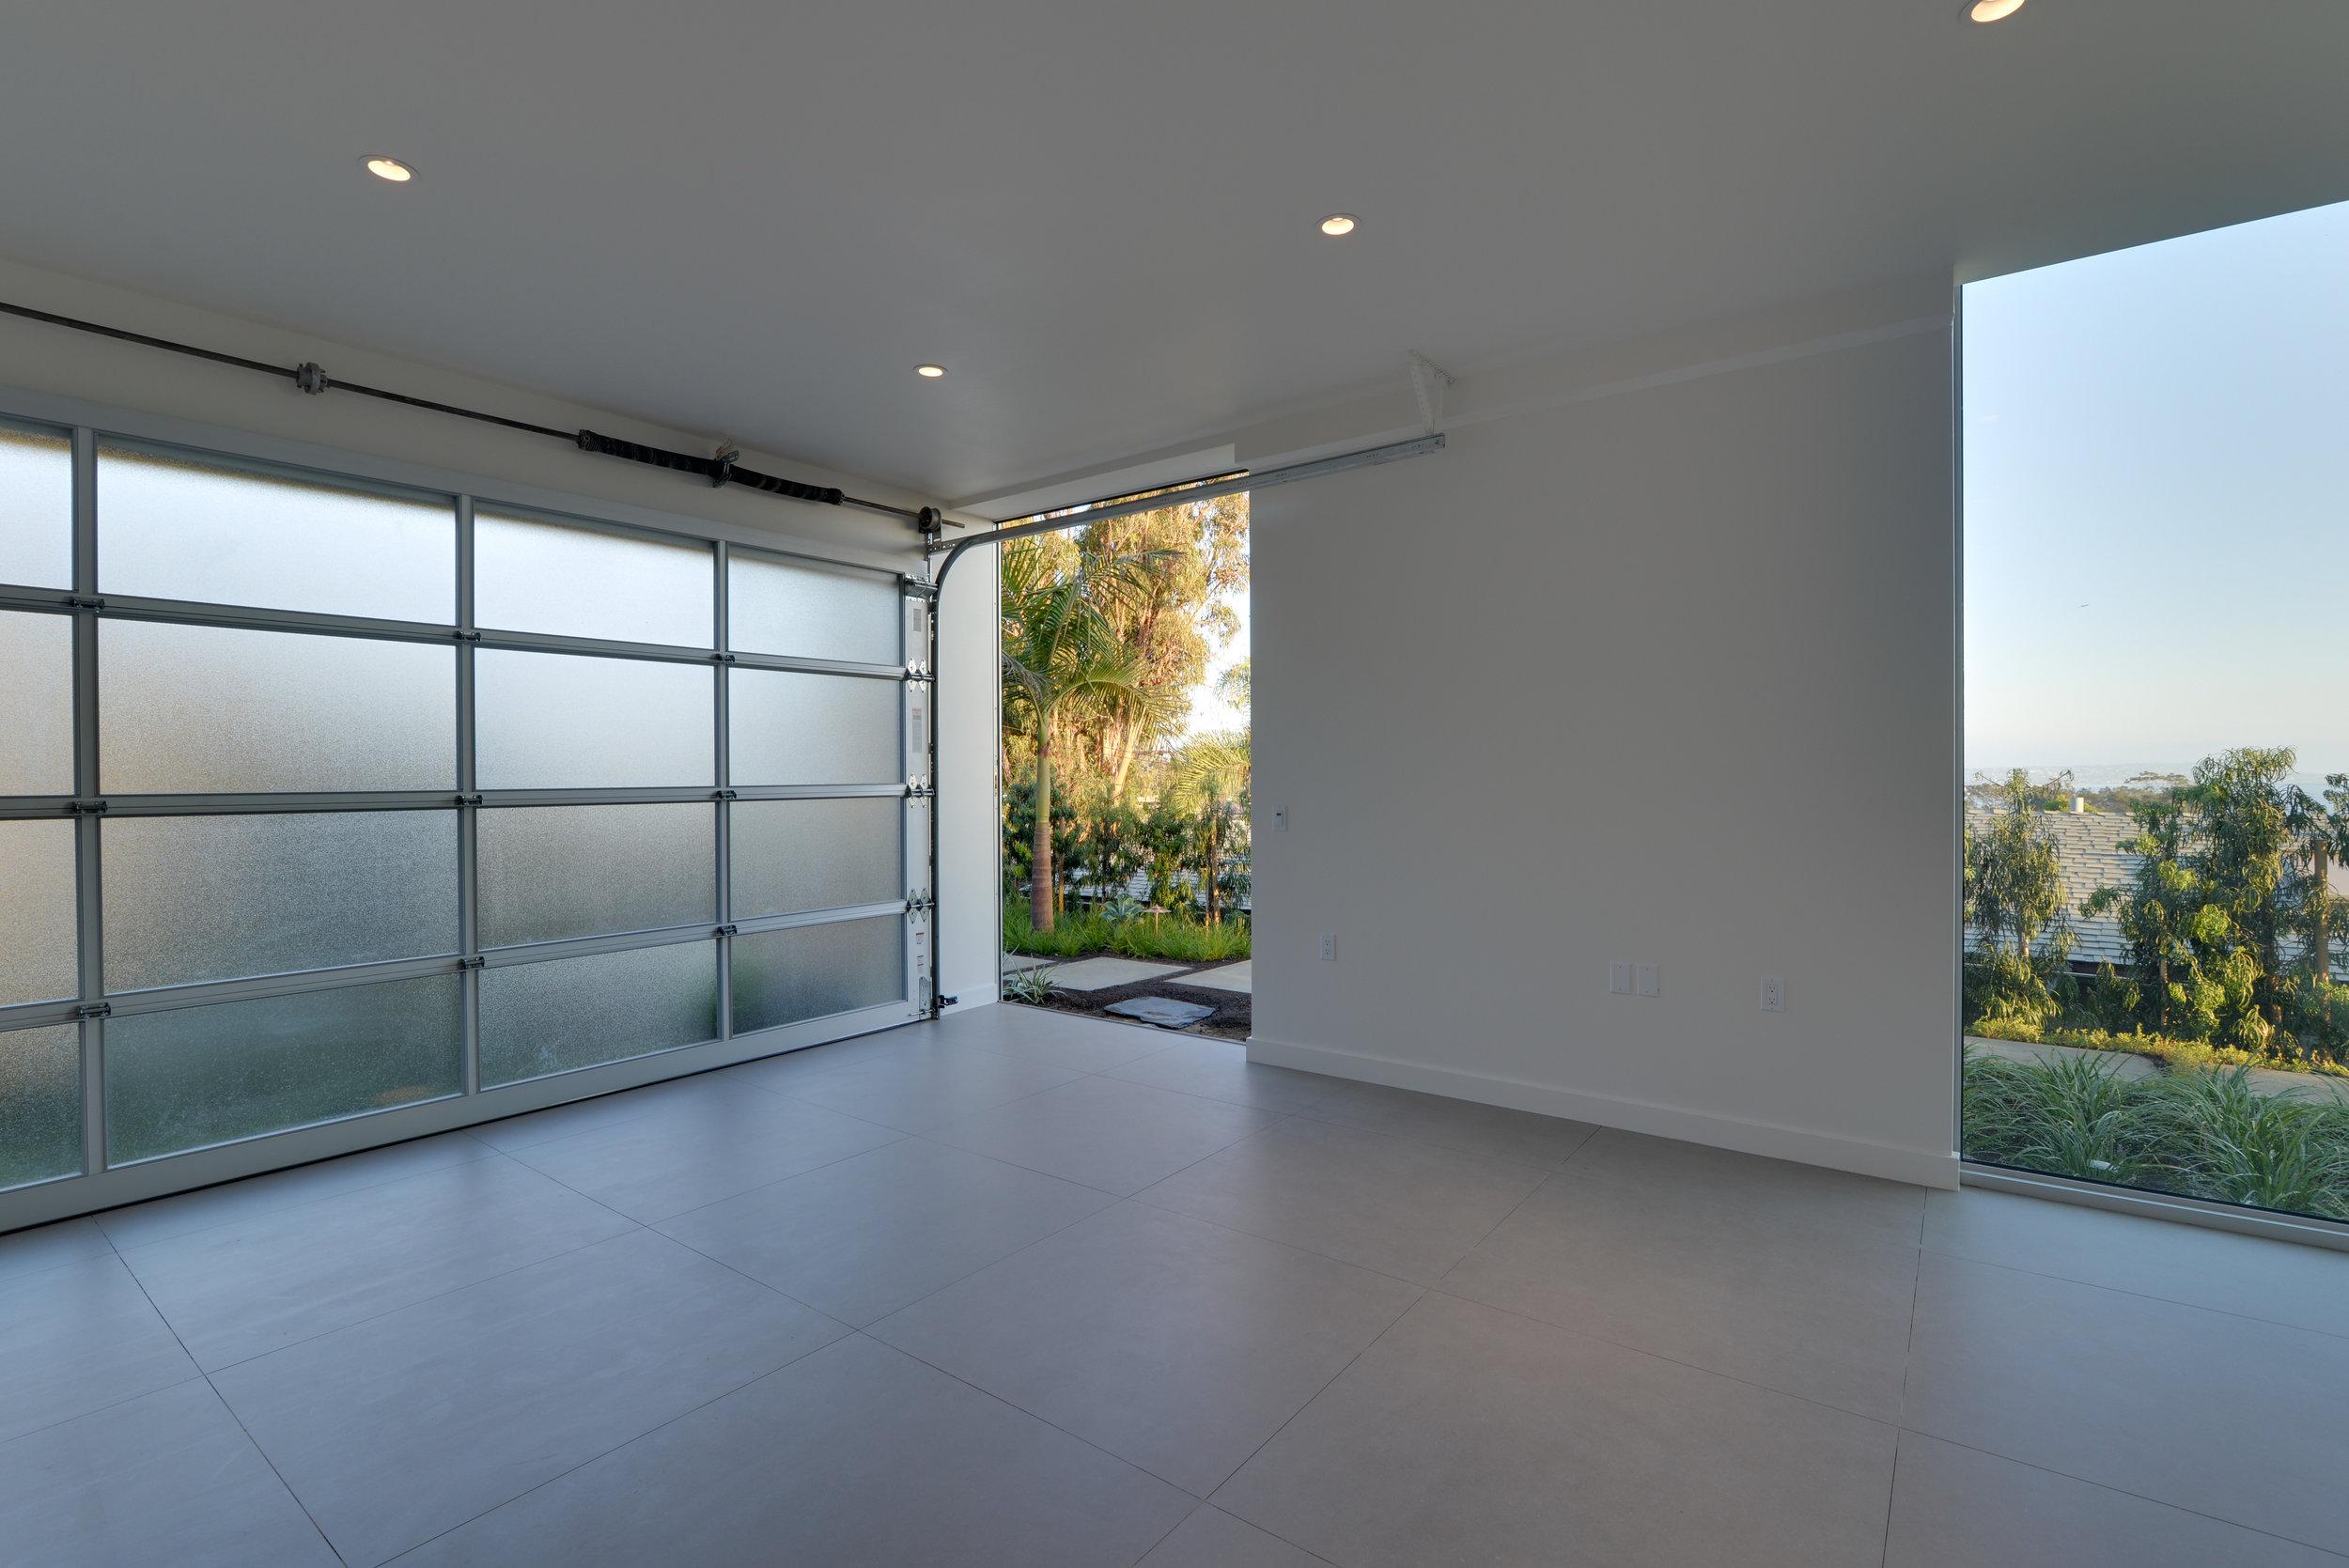 S.E.A.-Studio-Environmental-Architecture-David-Hertz-FAIA-Linda-Rosa-House-La-Jolla-San-Diego-sustainable-regenerative-restorative-design-modern-residential-mindful-garden-panoramic-ocean-view-open-concept-california-dream-9.jpg